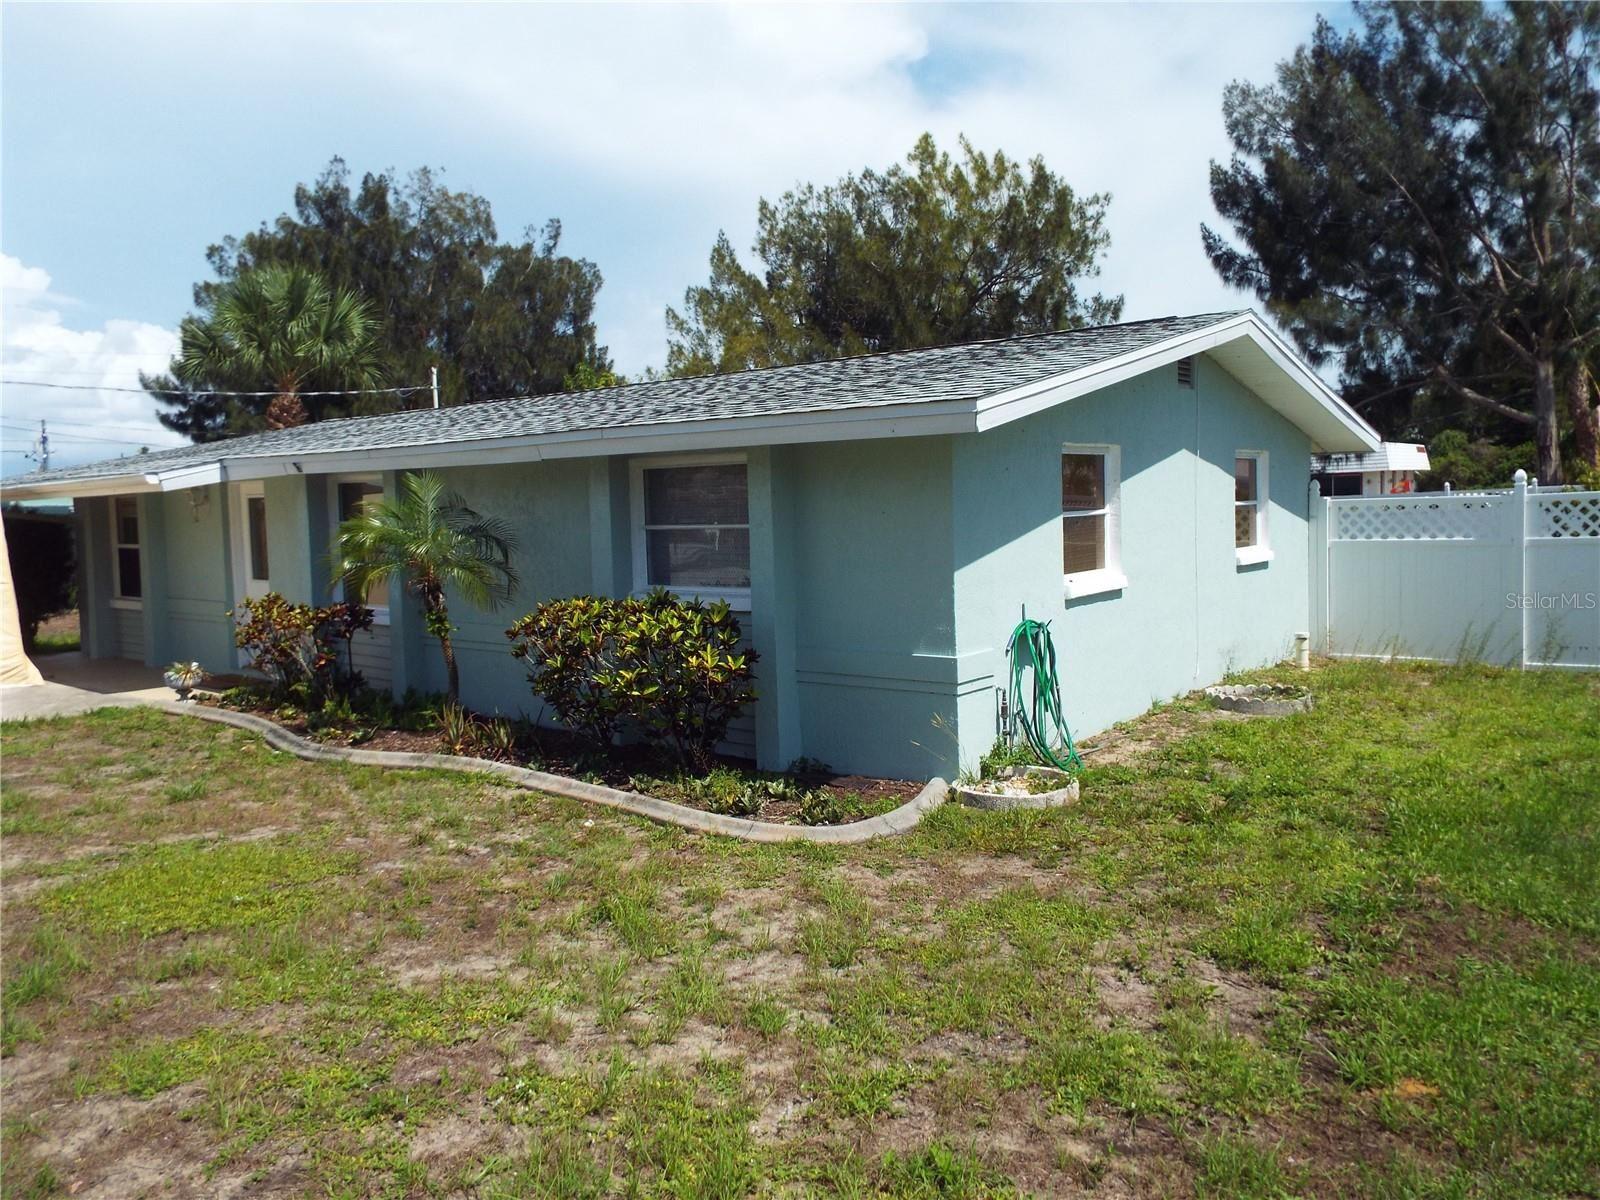 Photo of 1571 SAINT JUDE AVENUE, ENGLEWOOD, FL 34223 (MLS # D6119679)